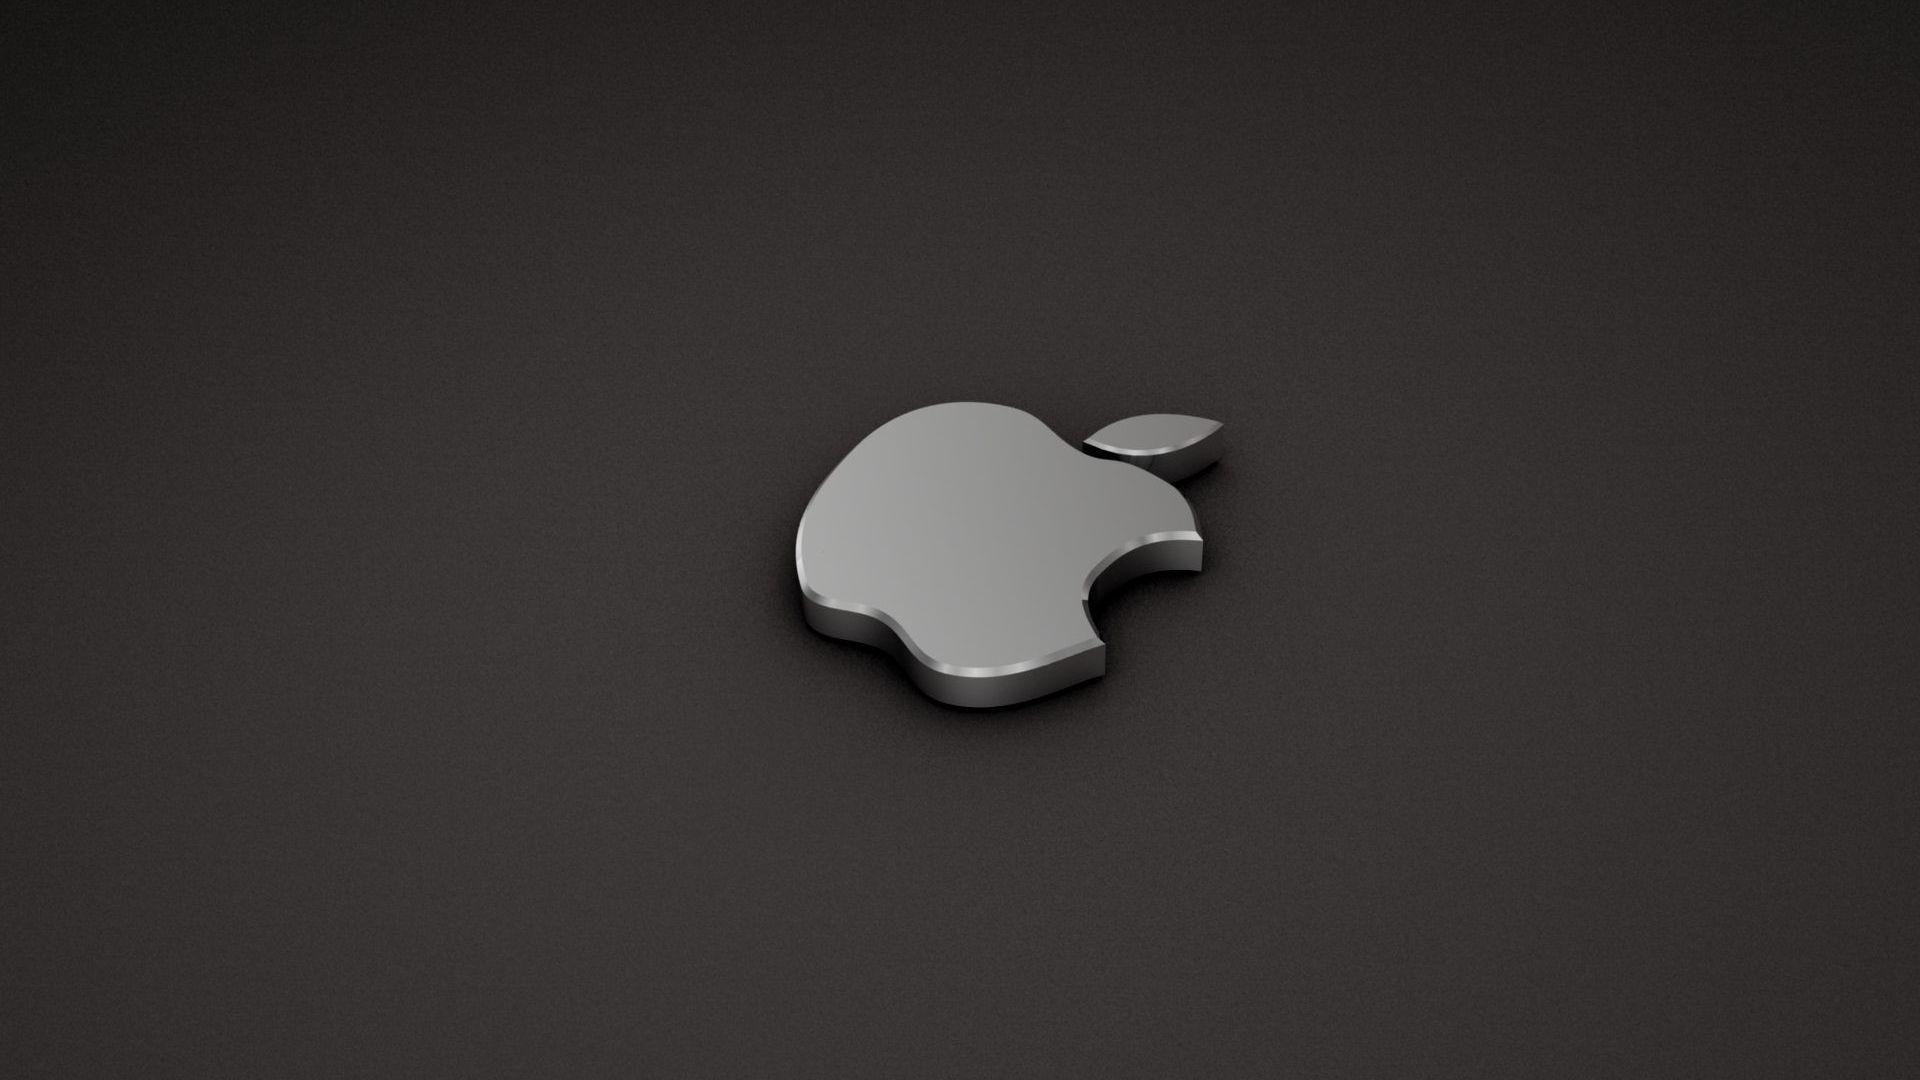 3d Black And White Mac Apple Logo Hd Wallpaper